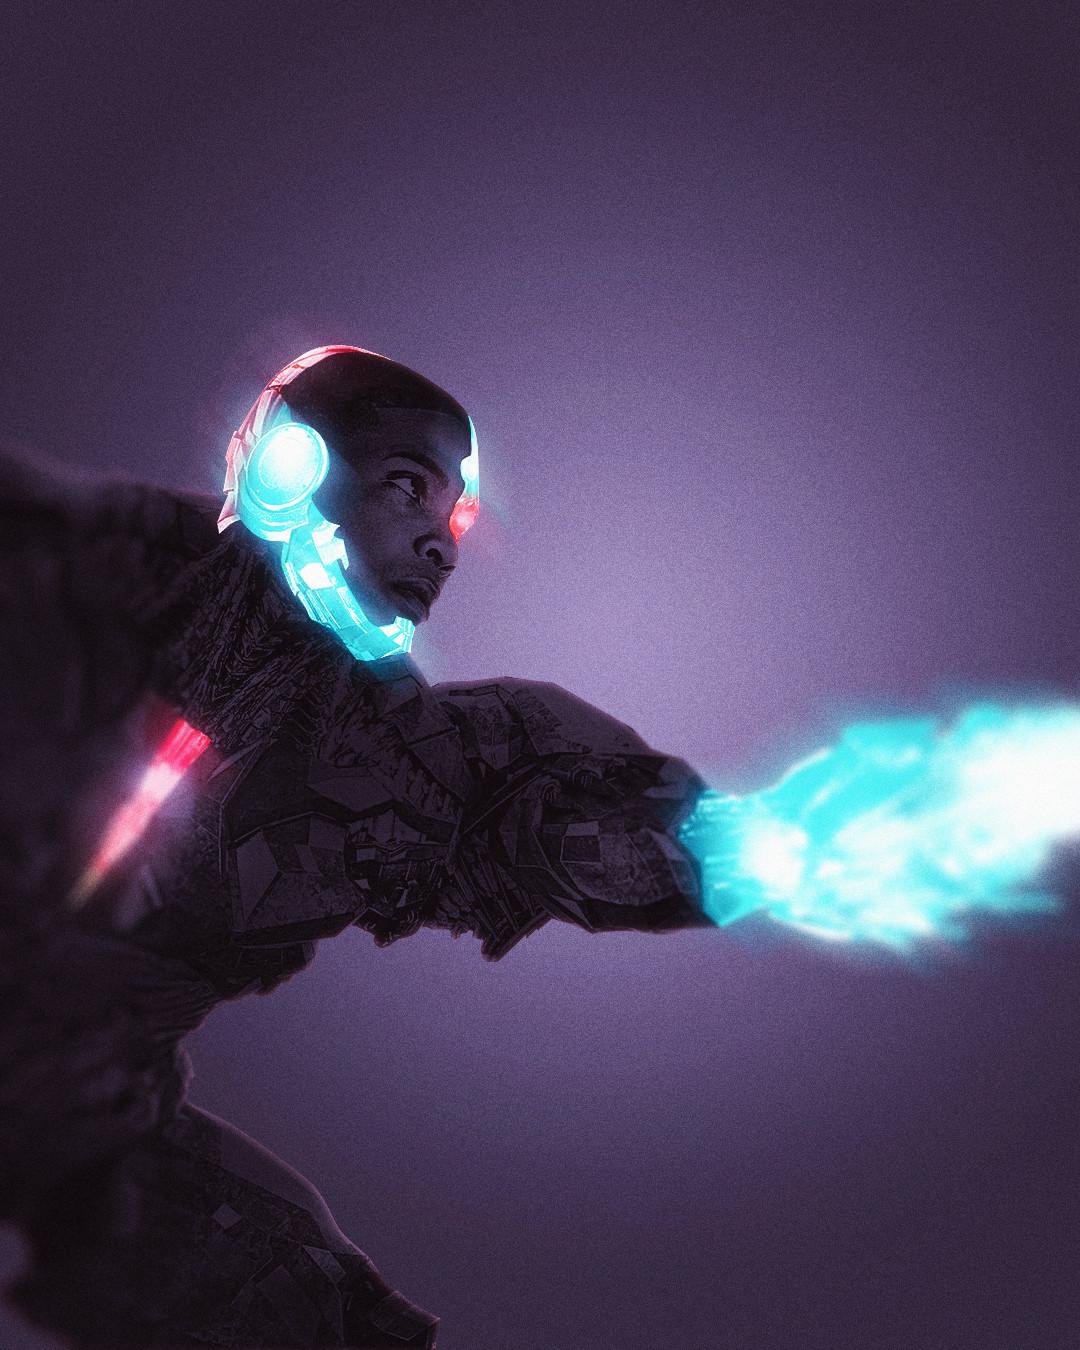 Nick tam masaolab justiceleague colorfun cyborg v1